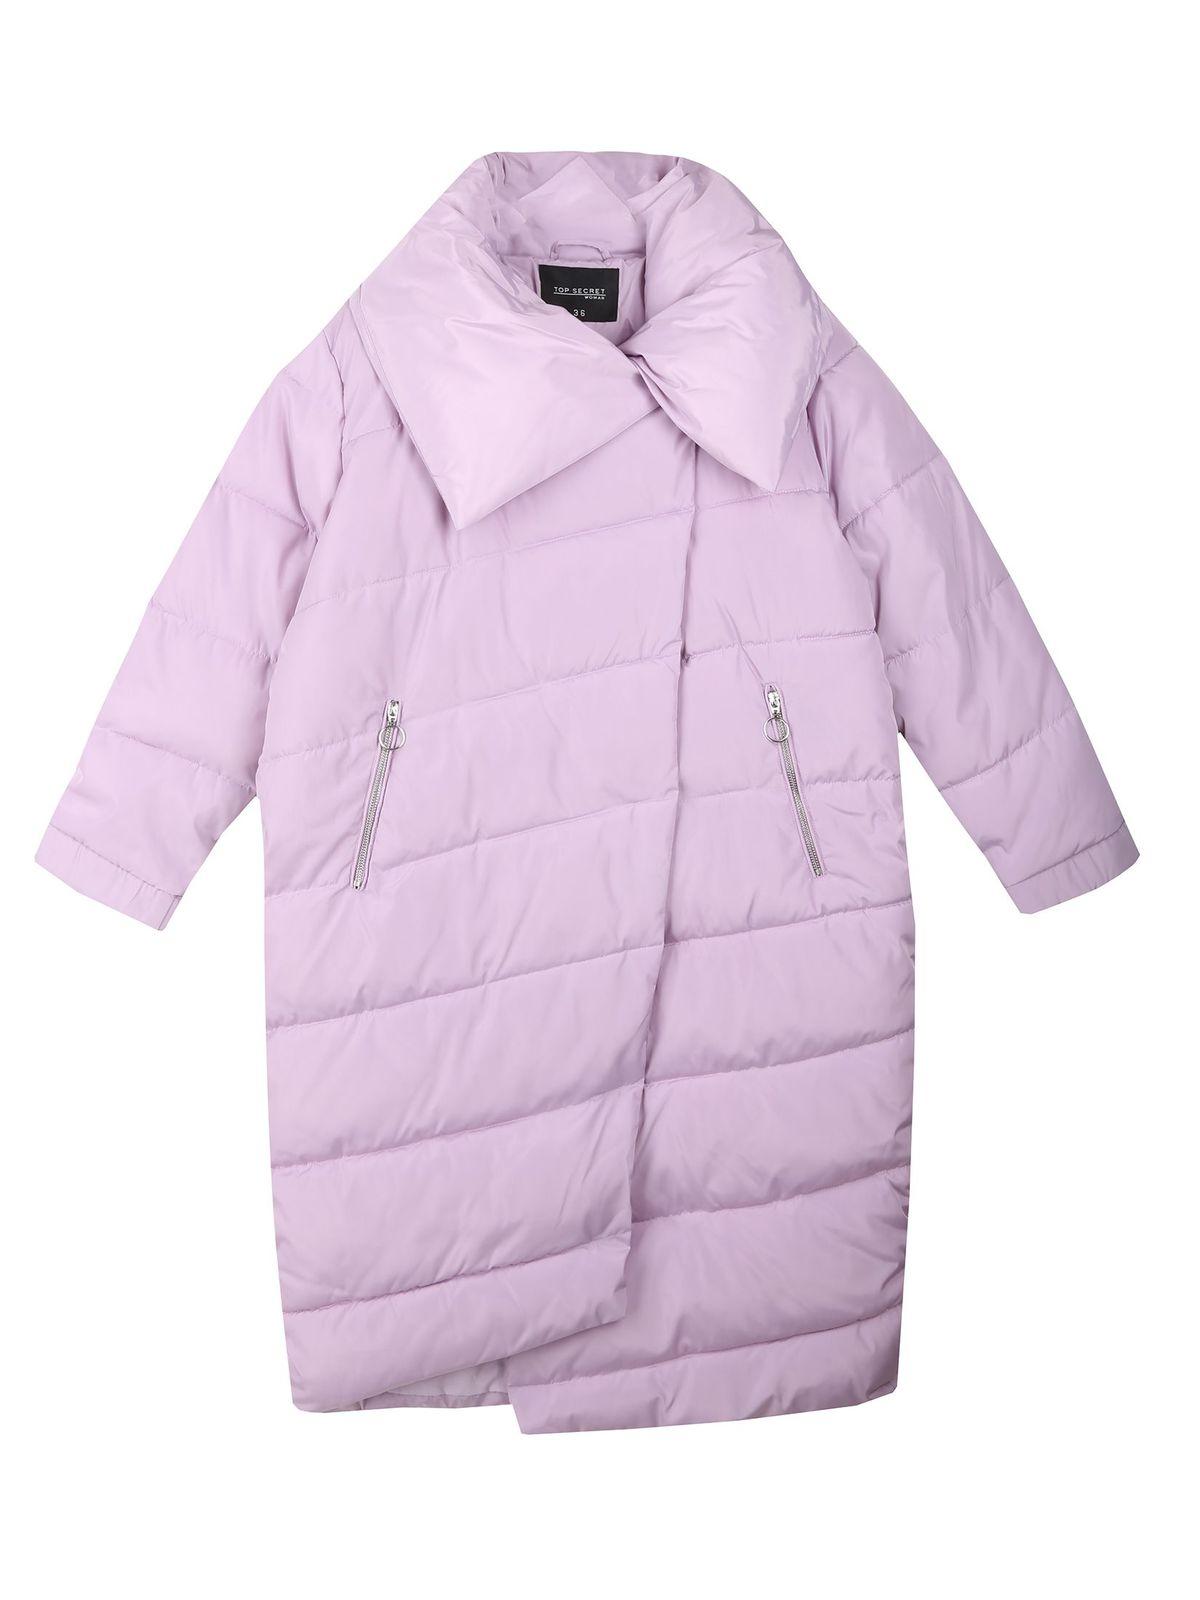 44ae8134e53 Γυναικεία Ρούχα, Σακάκια - Τζάκετς